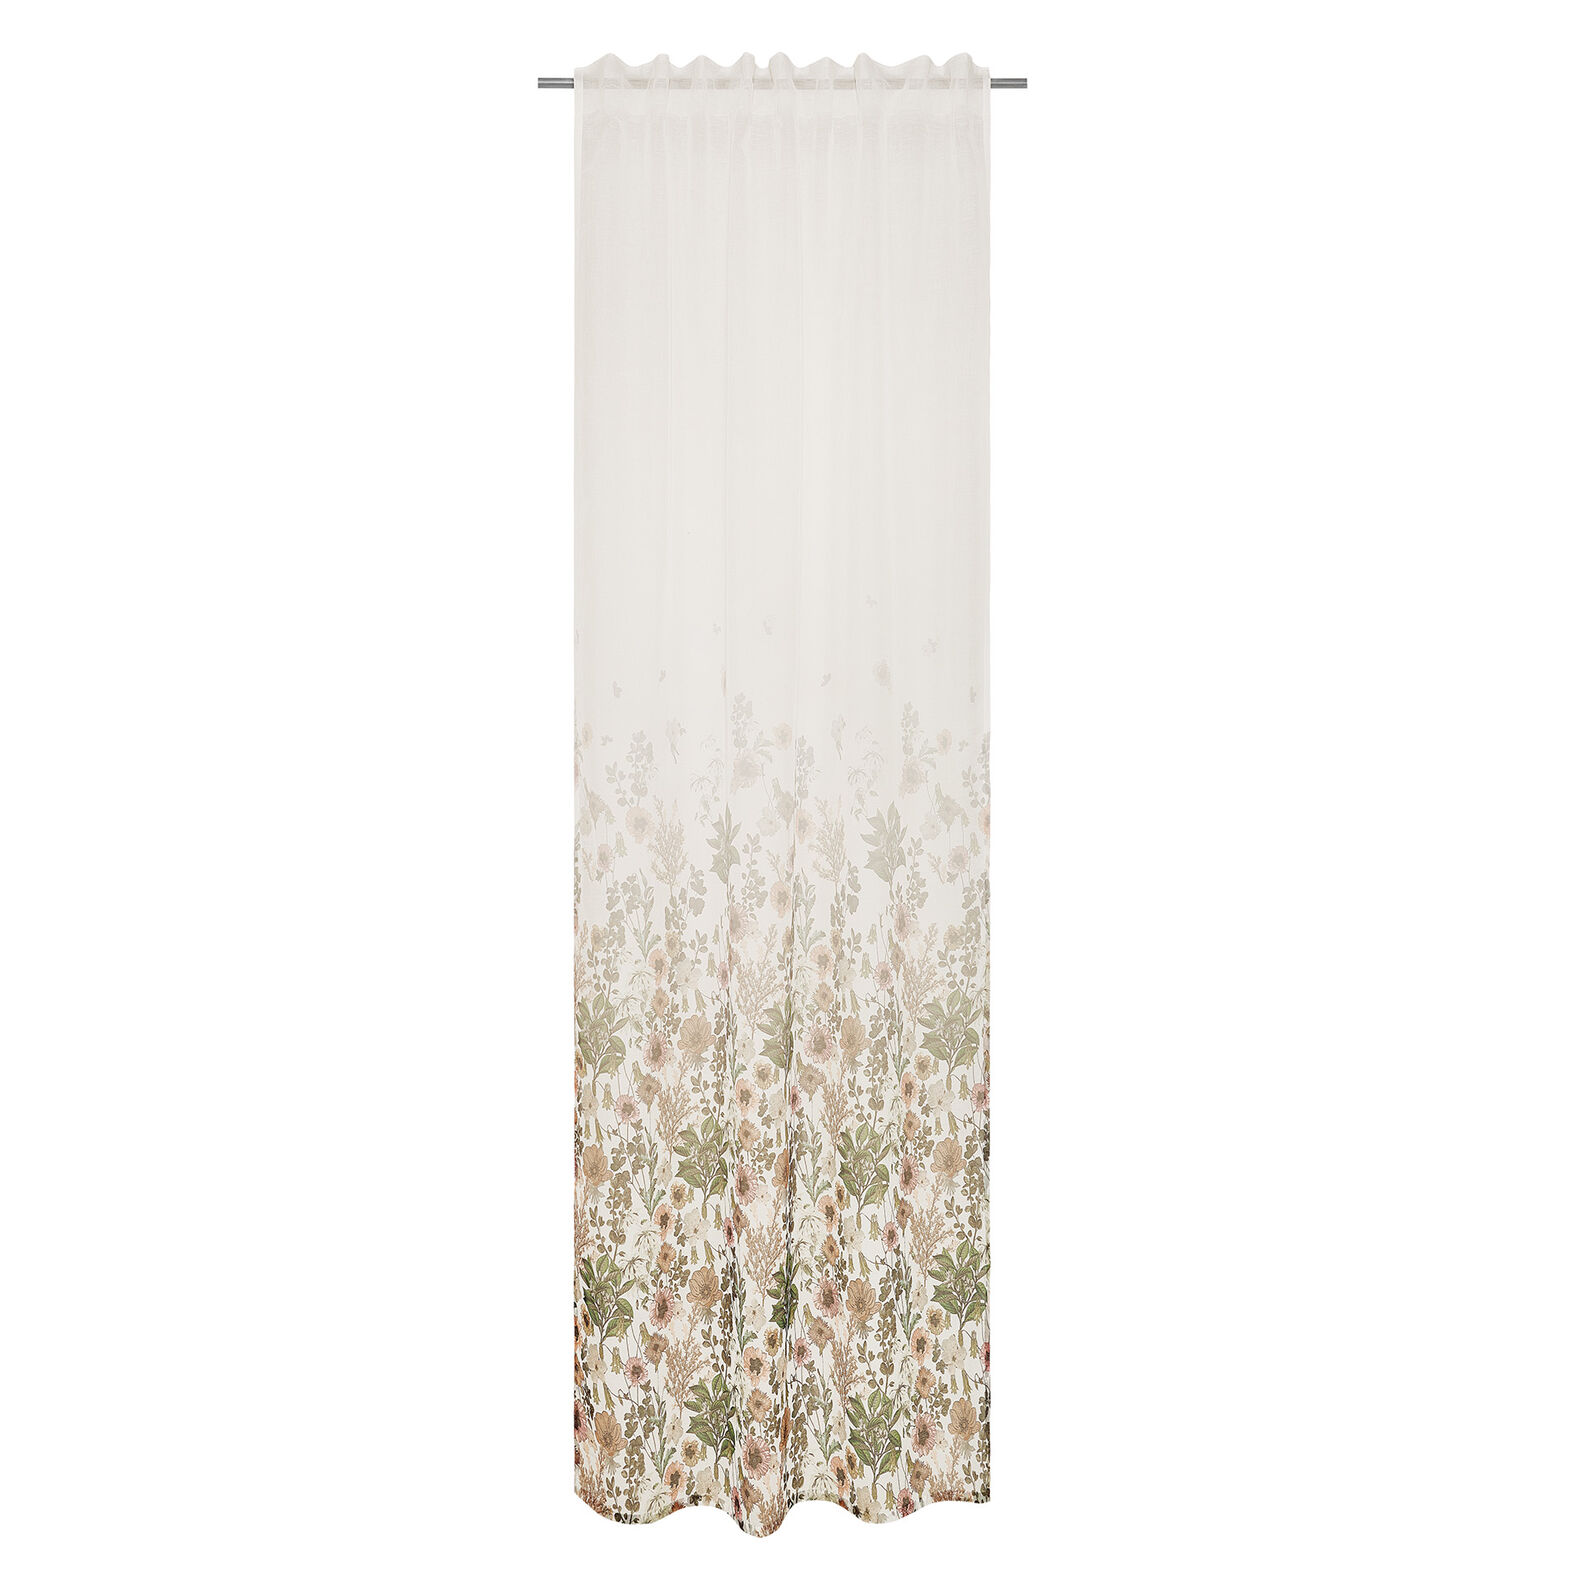 Tenda stampa floreale degradè